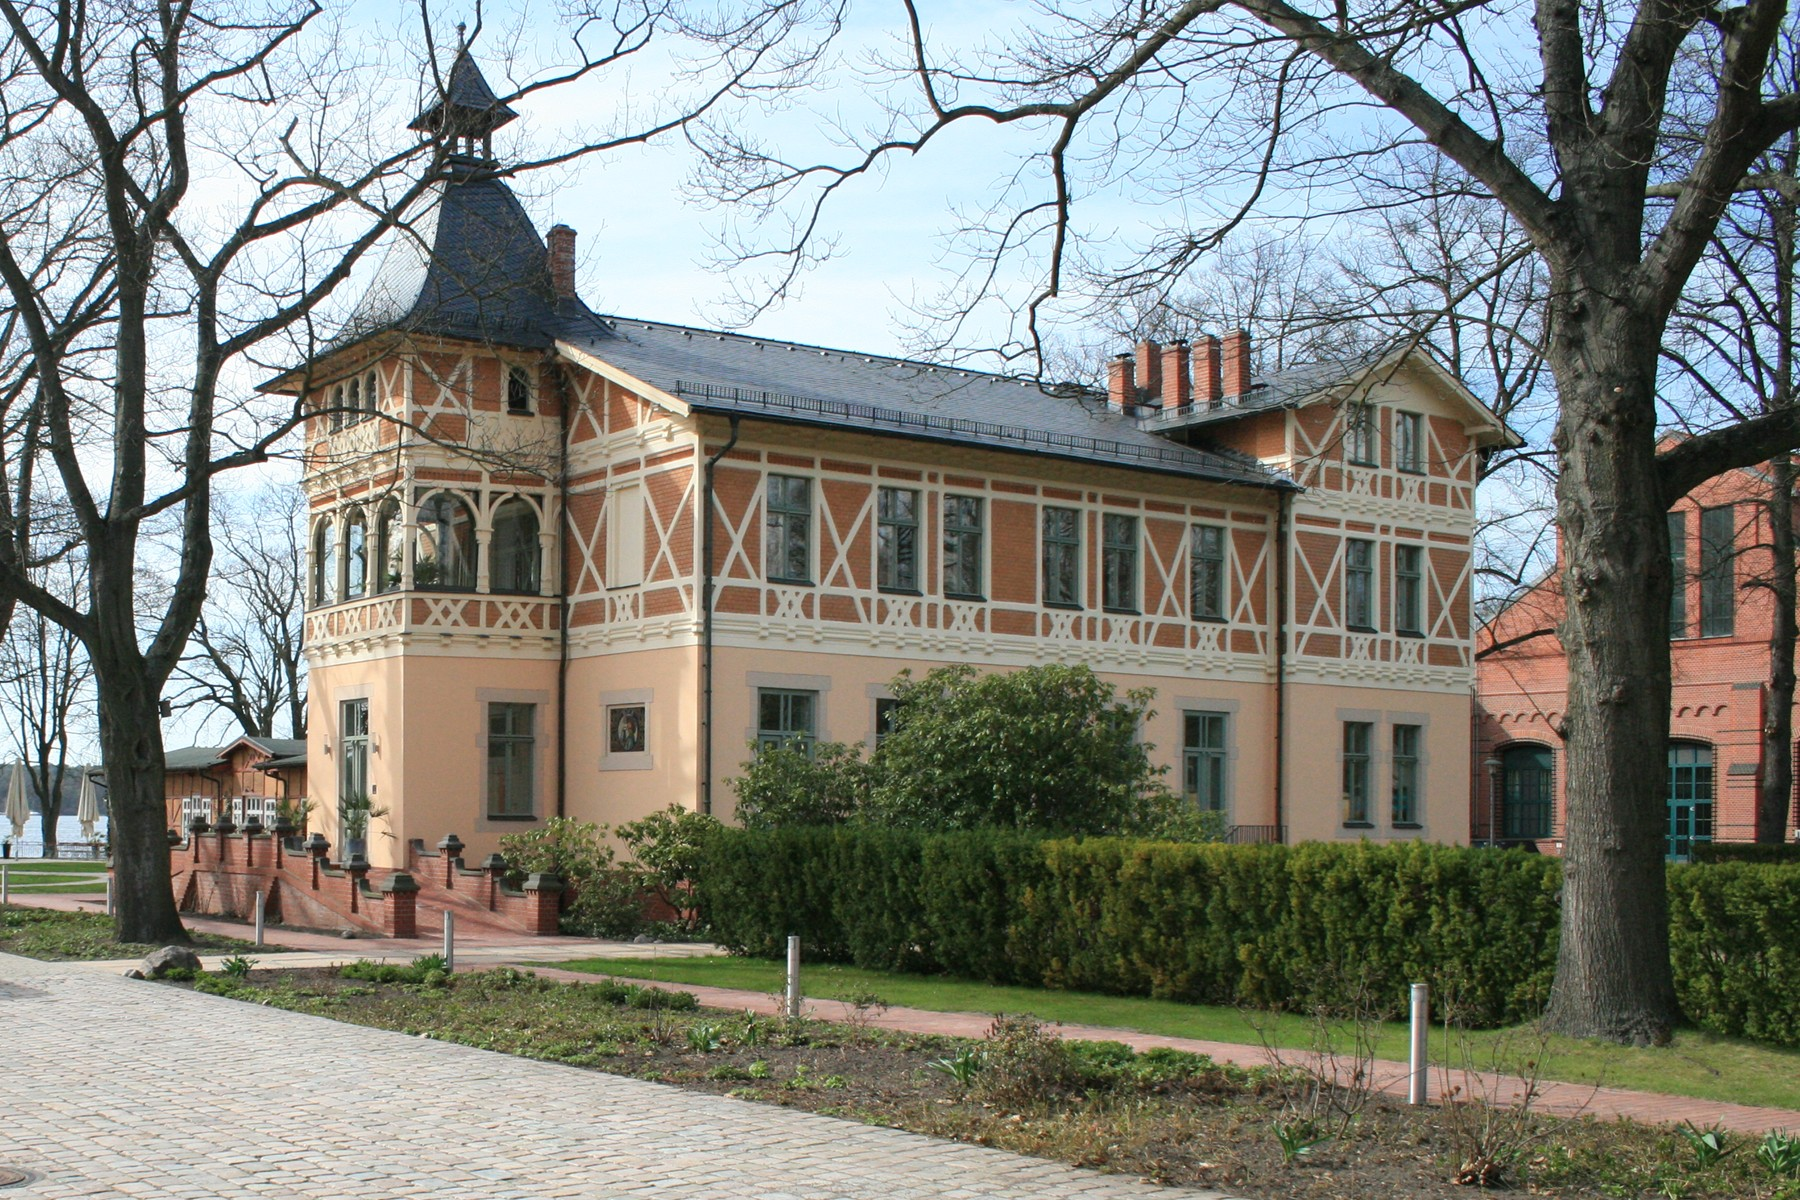 Sommerküche Wiki : Datei:berlin nikolassee kronprinzessinnenweg 21 ldl 09075581.jpg